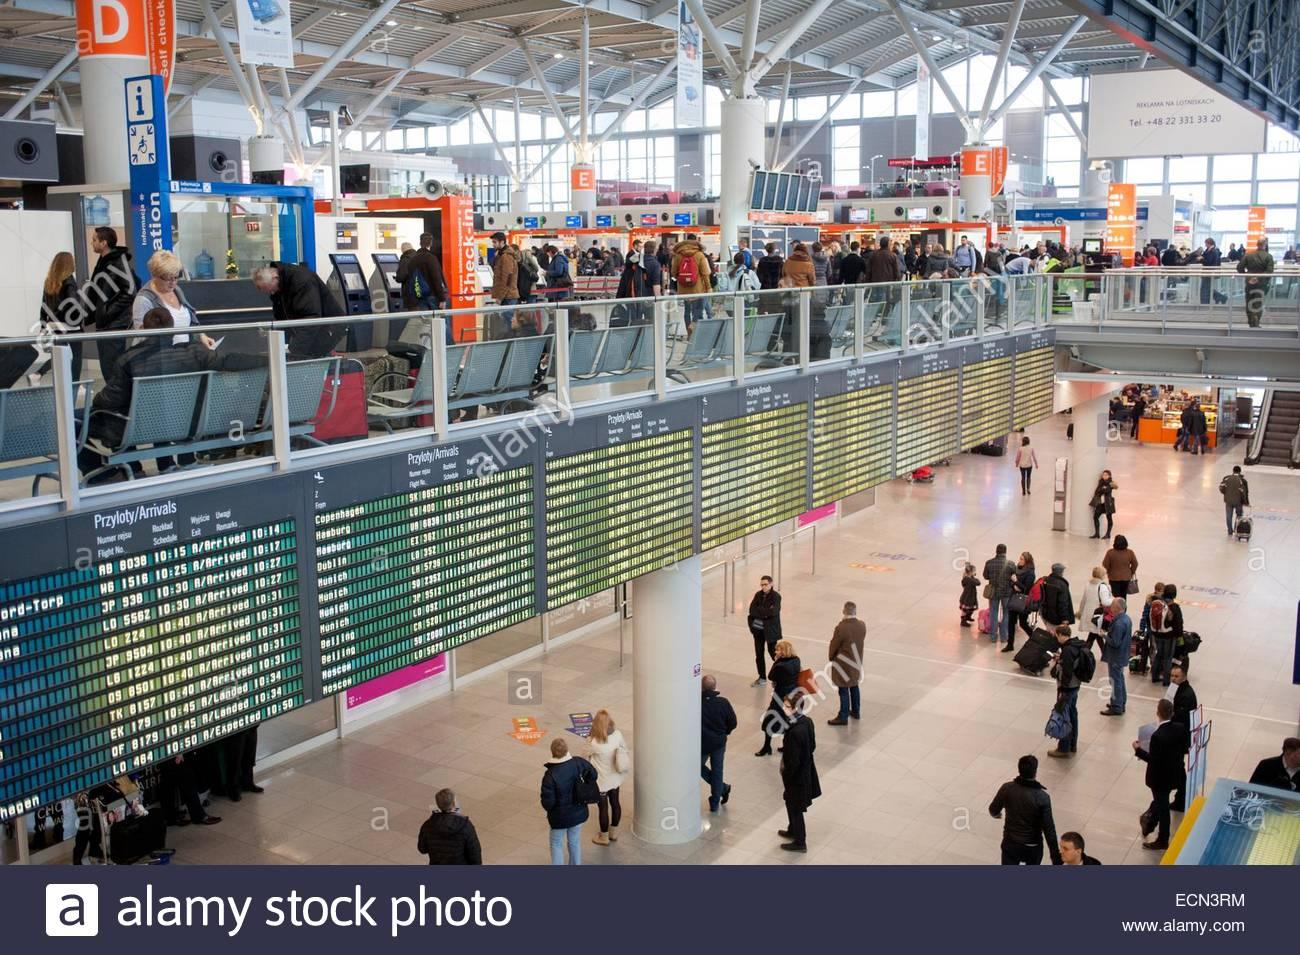 Aeroporto Waw : Warsaw poland warsaw chopin airport waw terminal interior stock